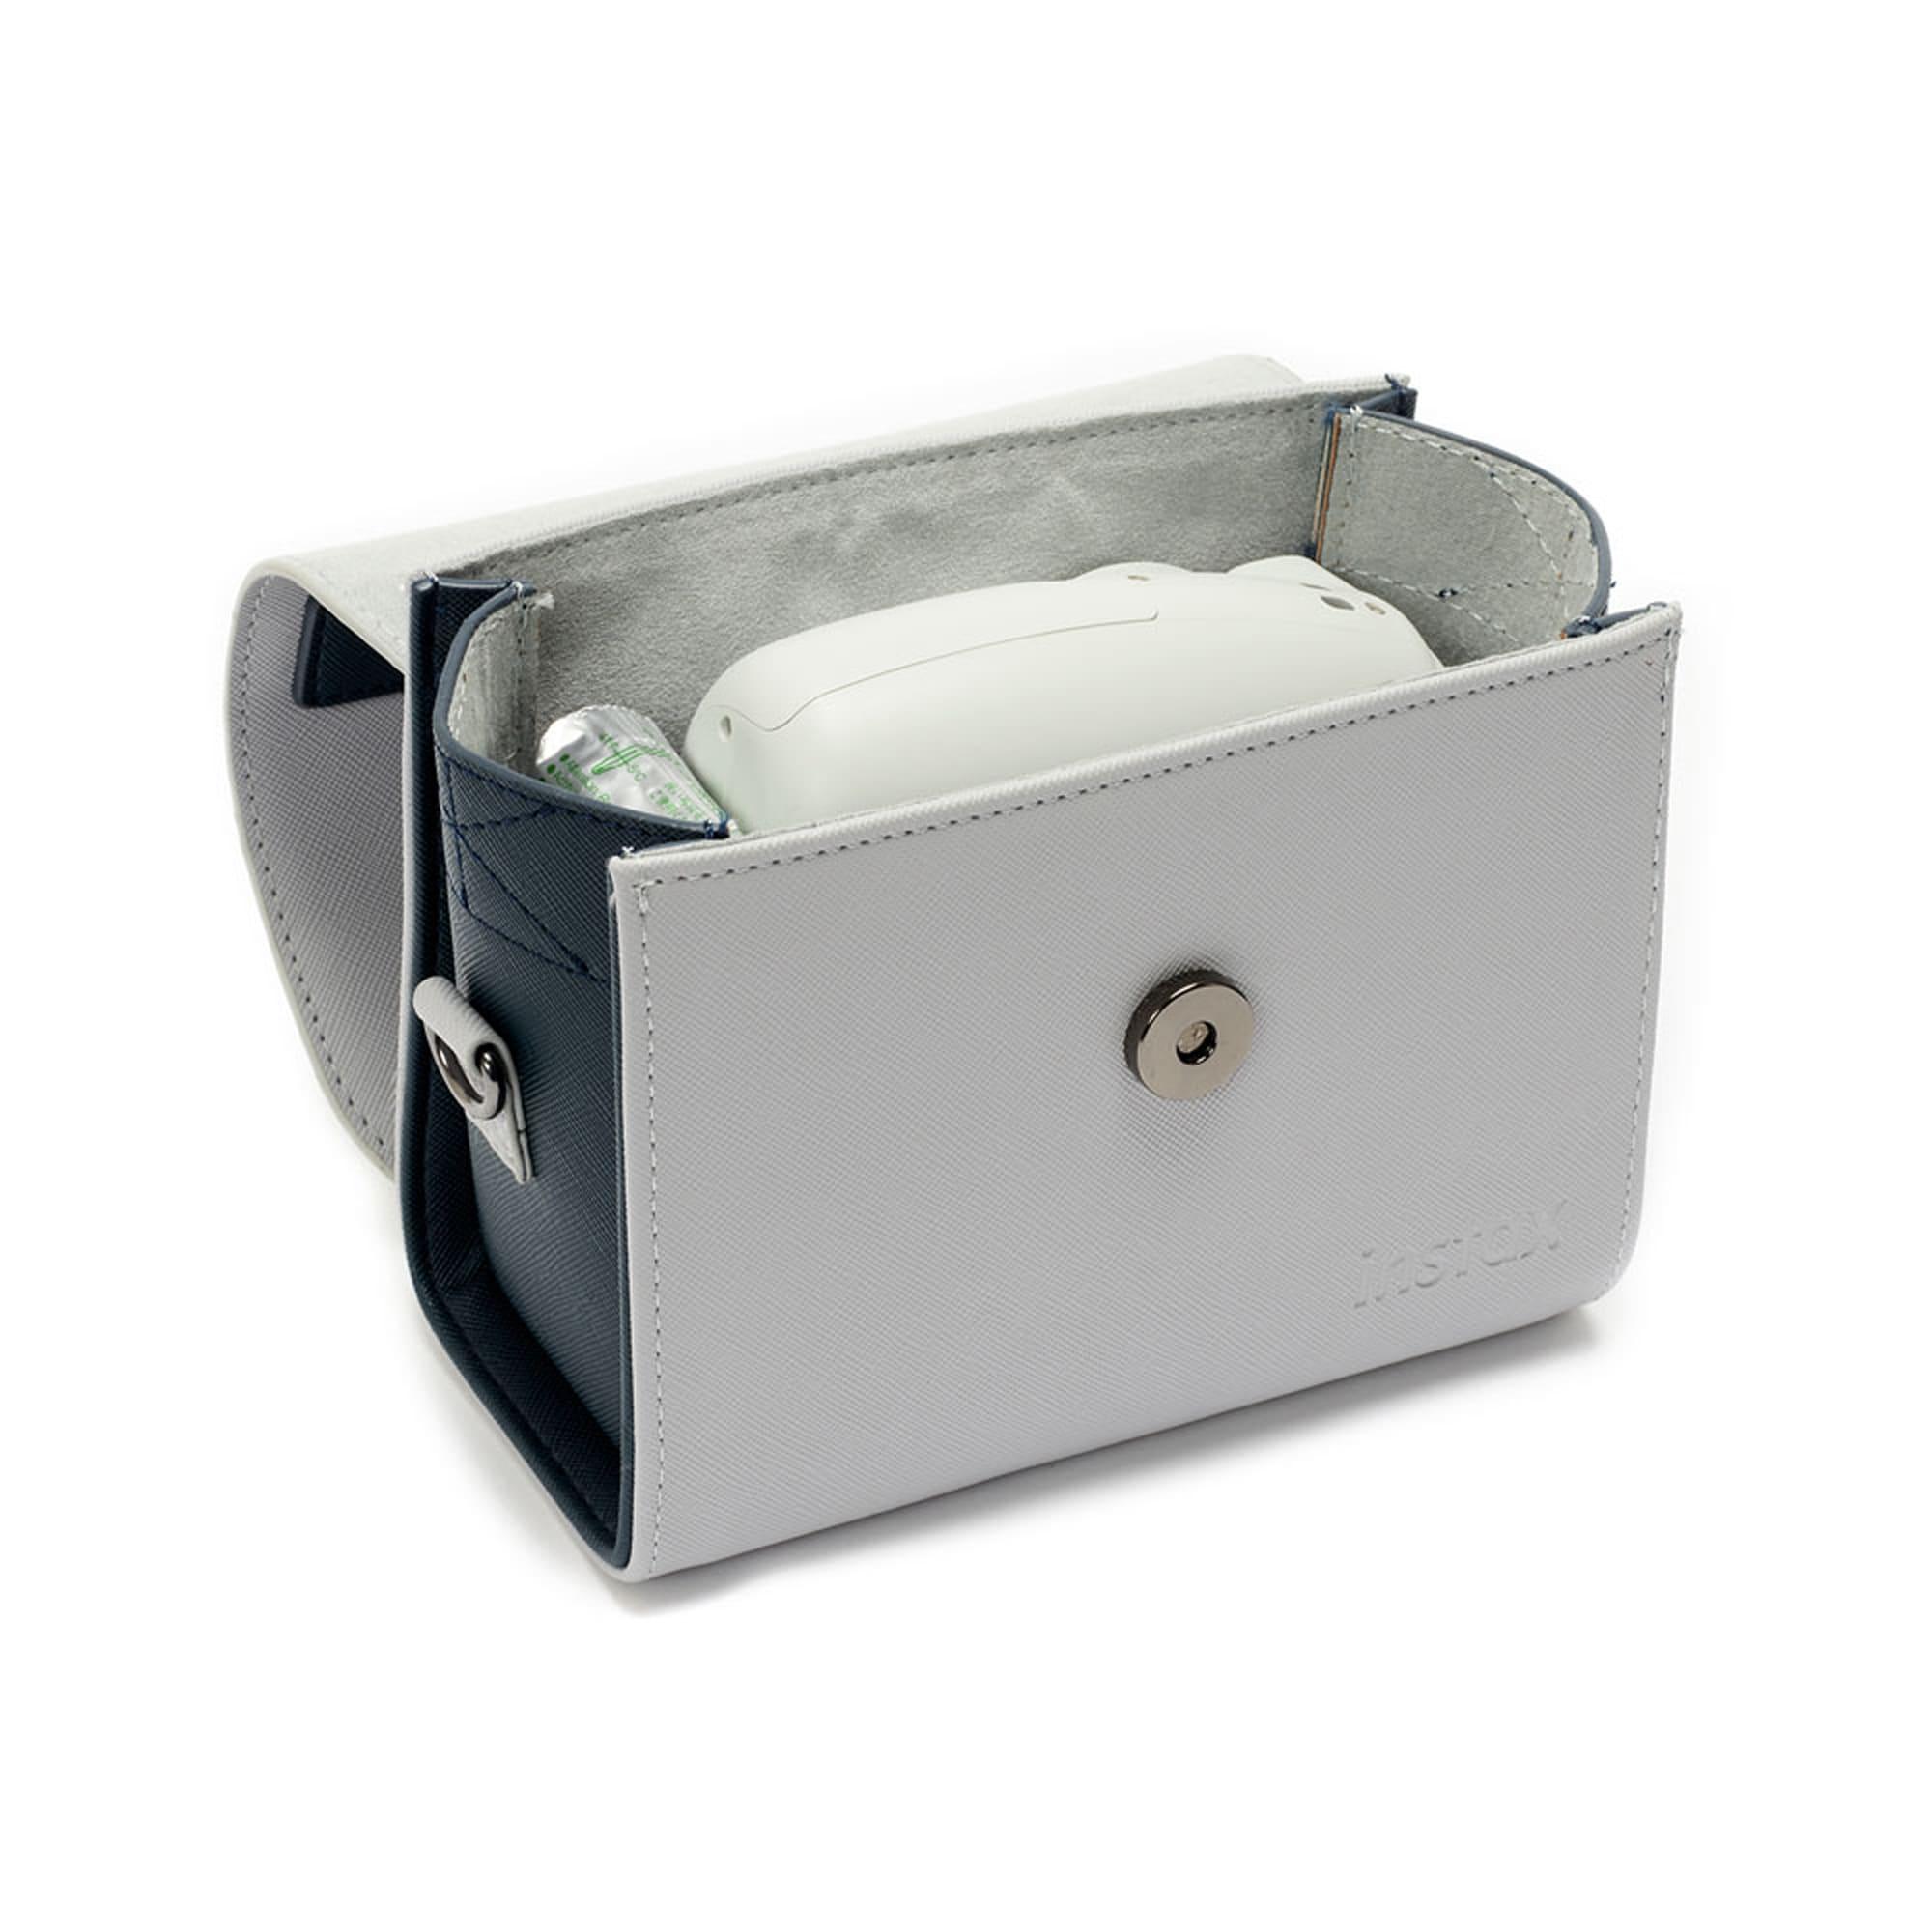 Fujifilm Instax Mini 9 Väska Smokey White Med Handtag